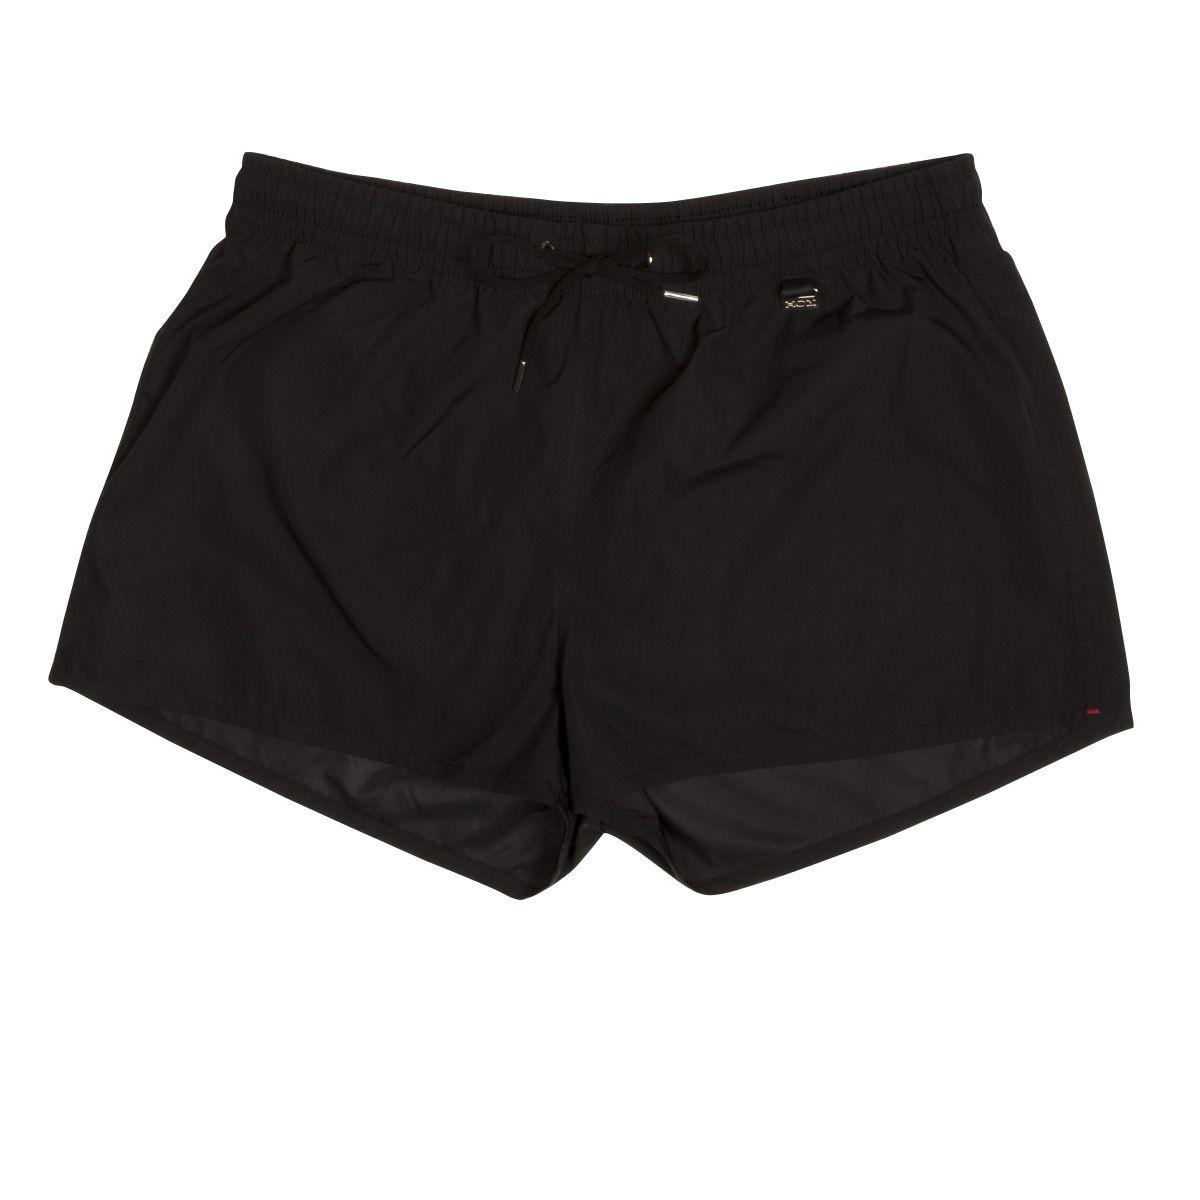 Short de bain   Splash noir polyester